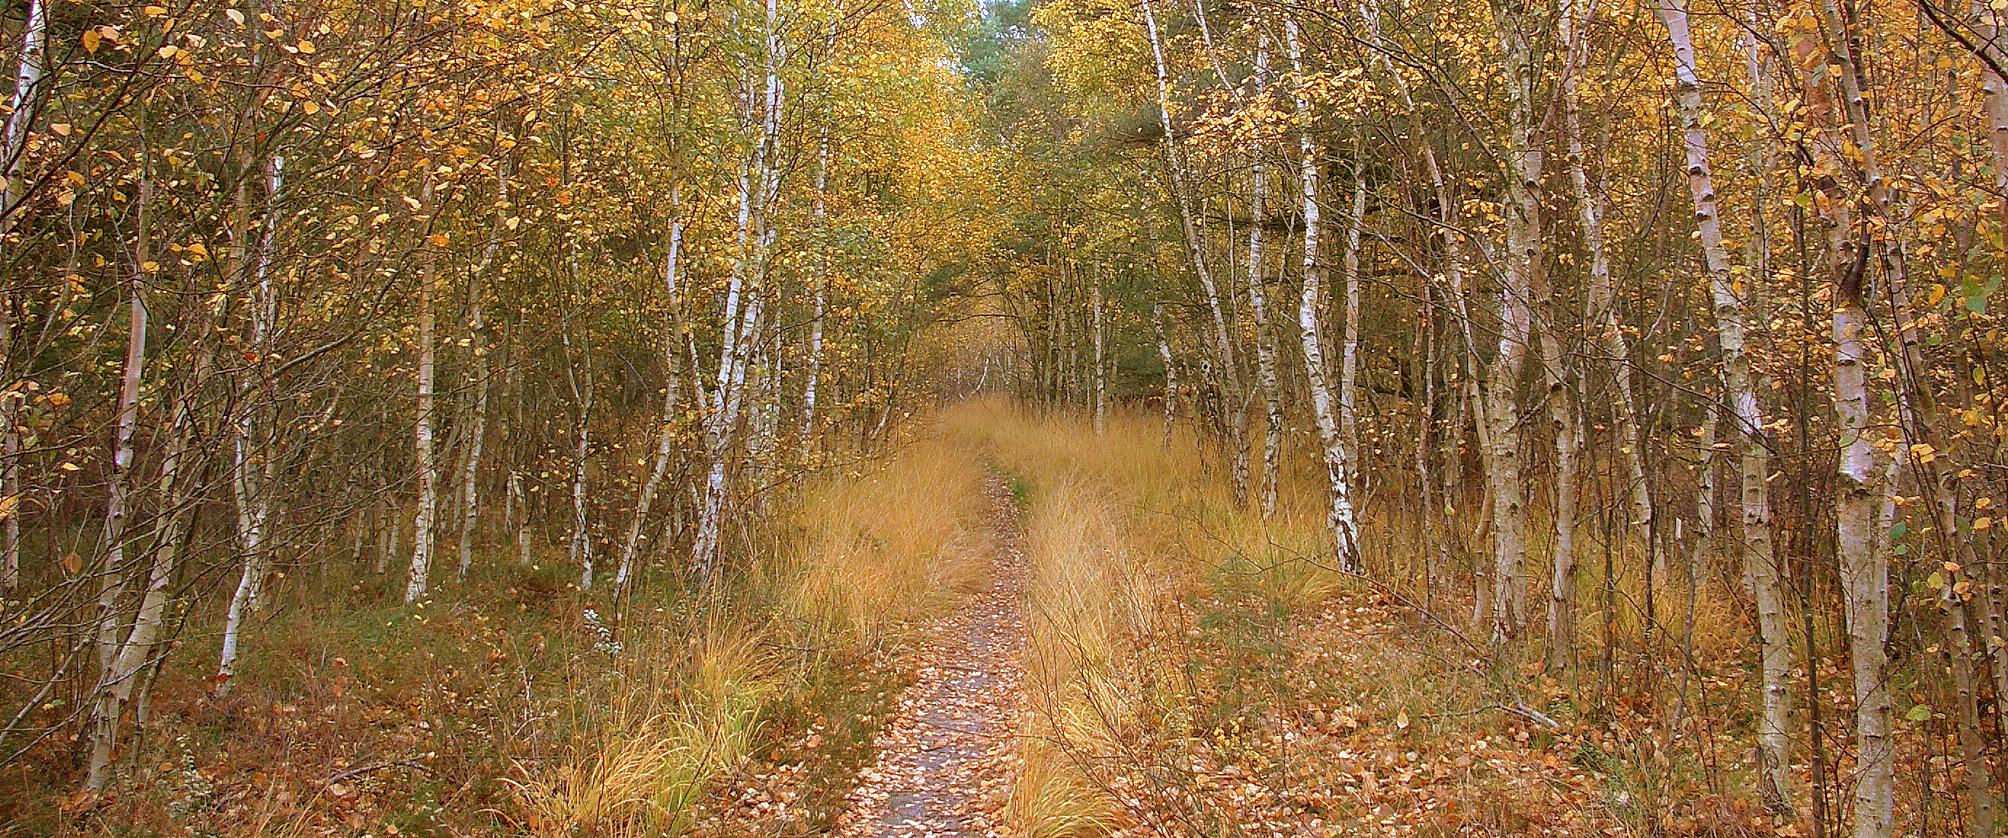 Herbst in der Dünenheide